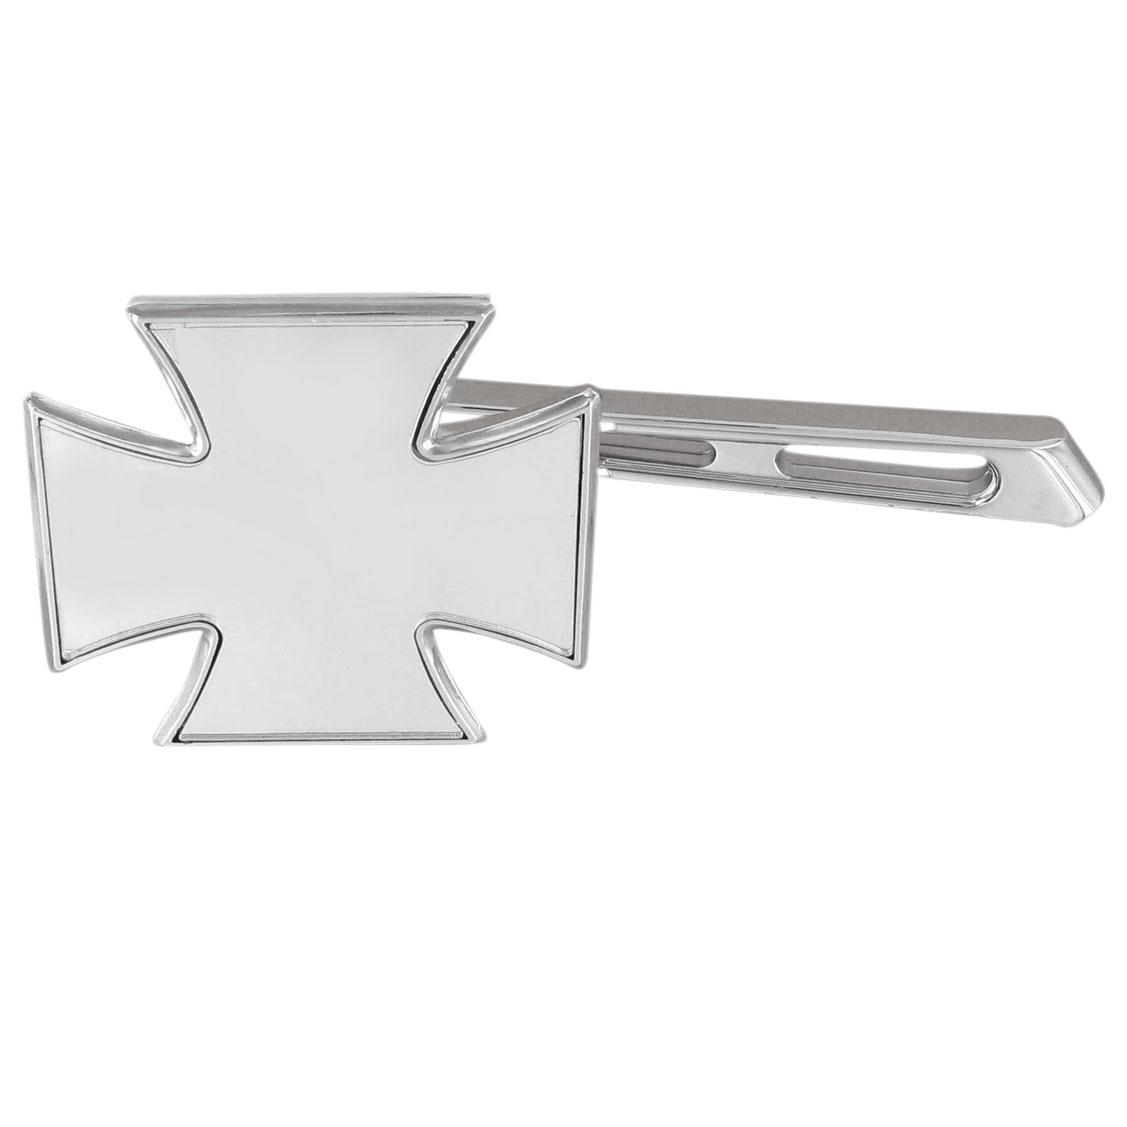 J&P Cycles Chrome Maltese Mirror with Air Glide Stem